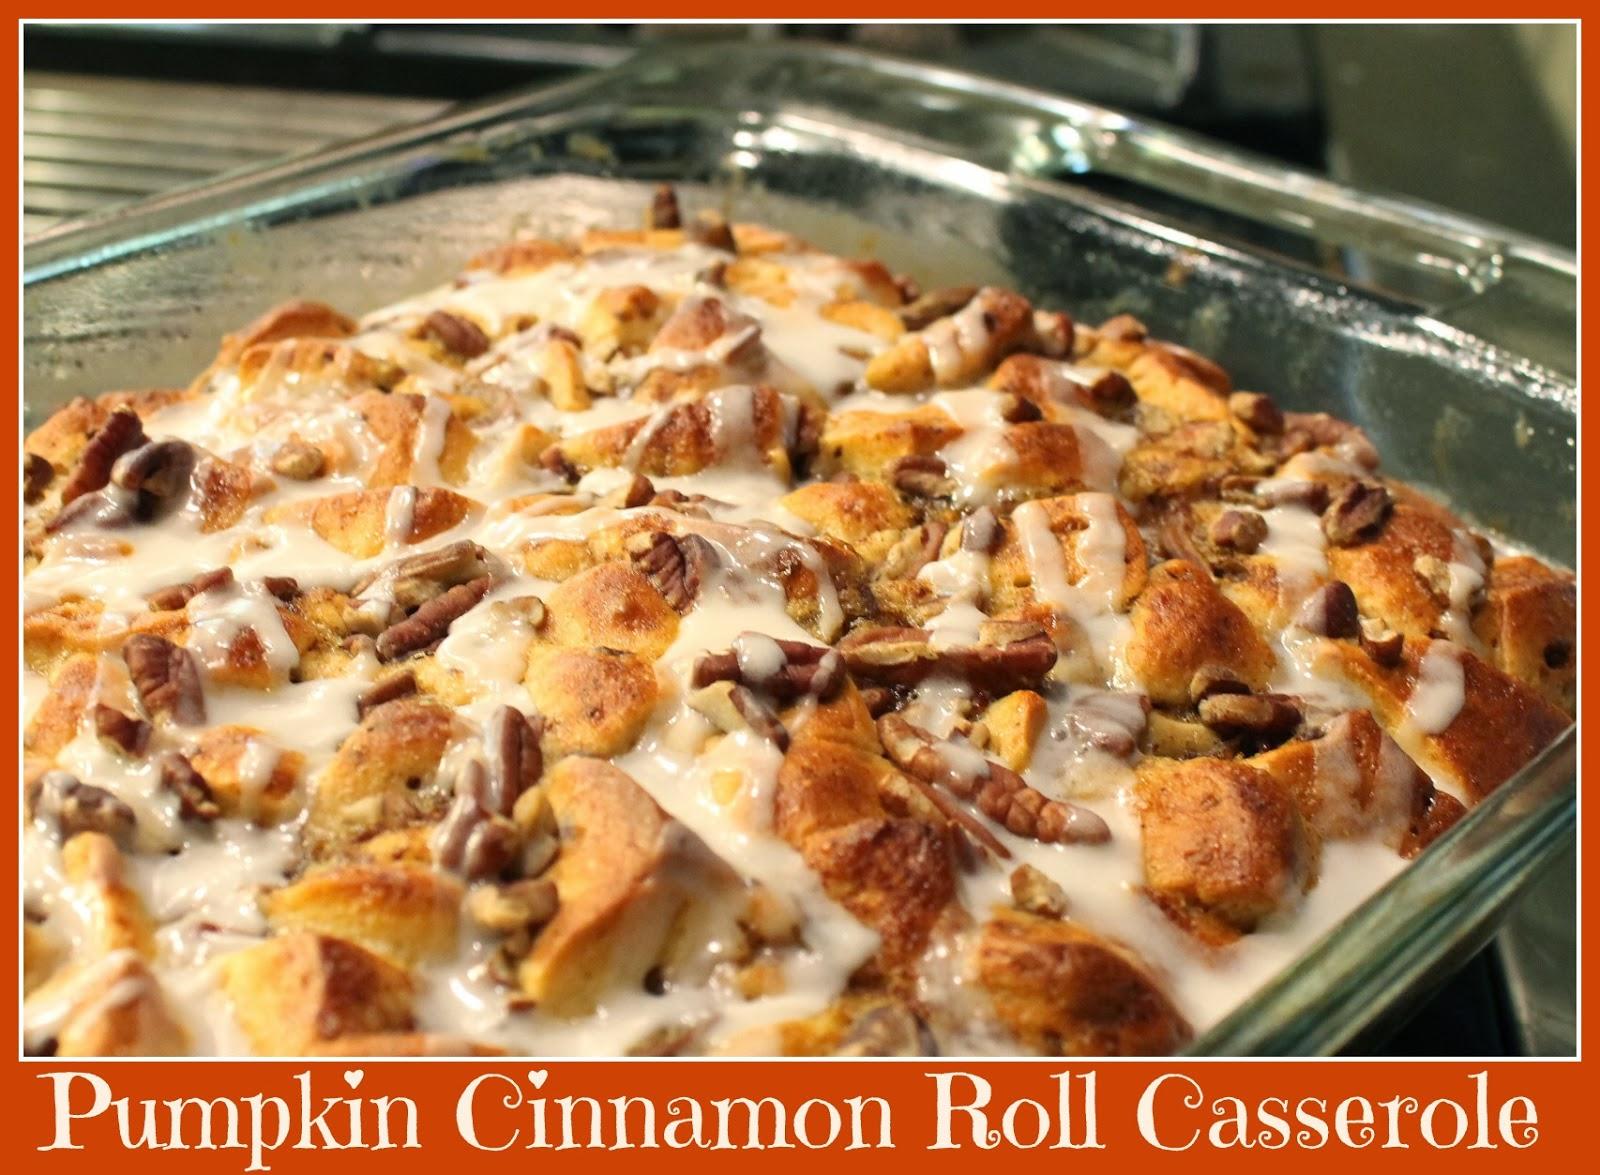 casserole pumpkin casserole pumpkin casserole pumpkin casserole ...